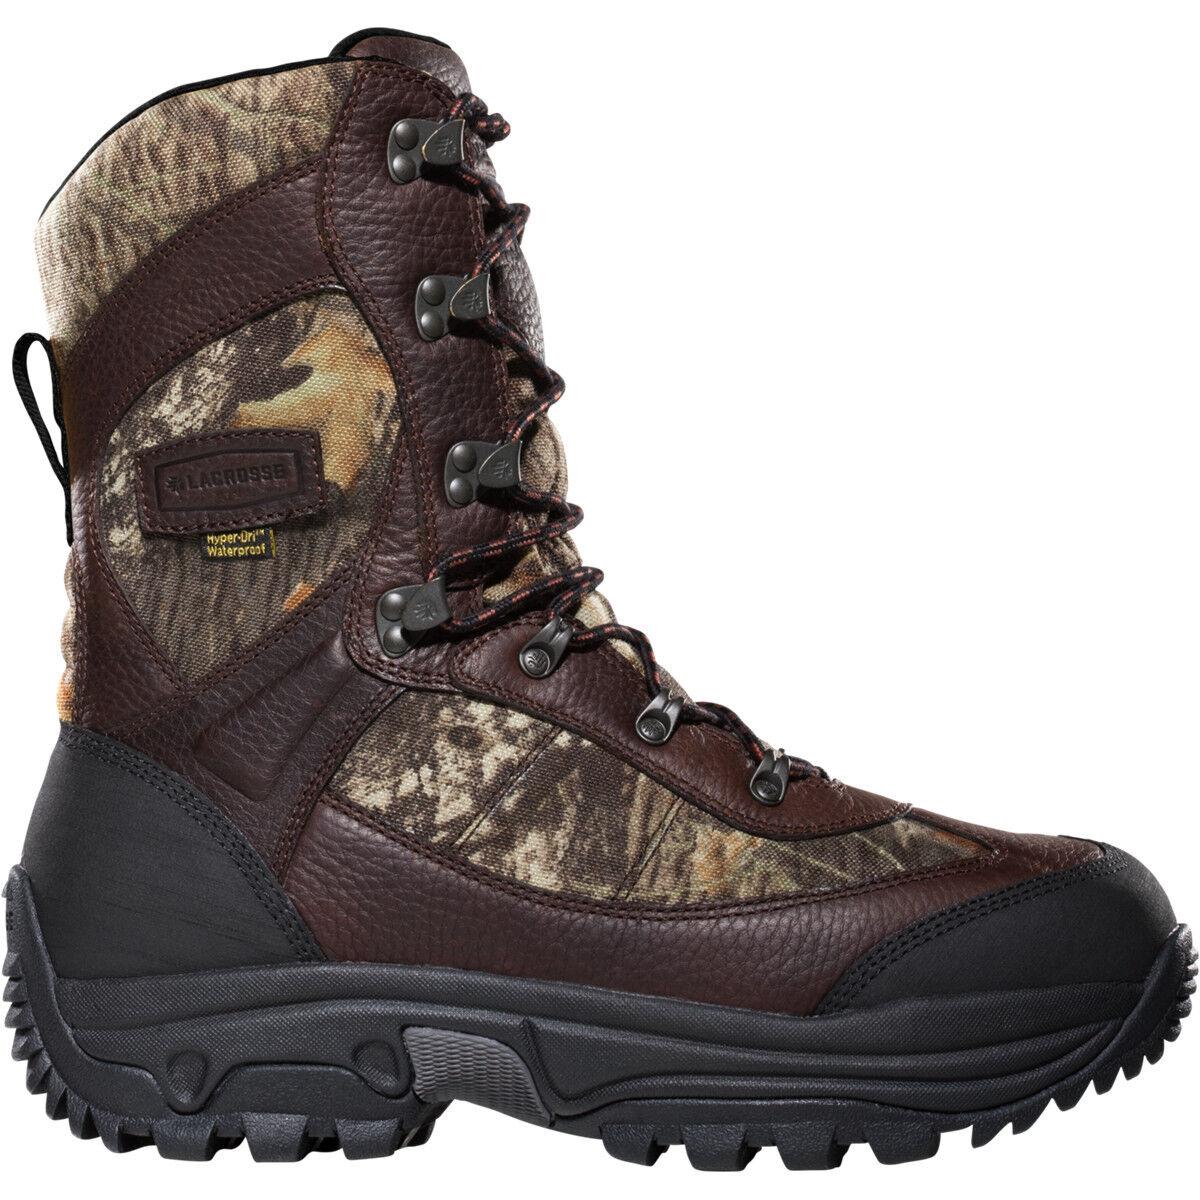 Lacrosse Men's 283160 Hunt Pac Extreme 10  Mossy Oak Break-Up 2000G Hunting Boot